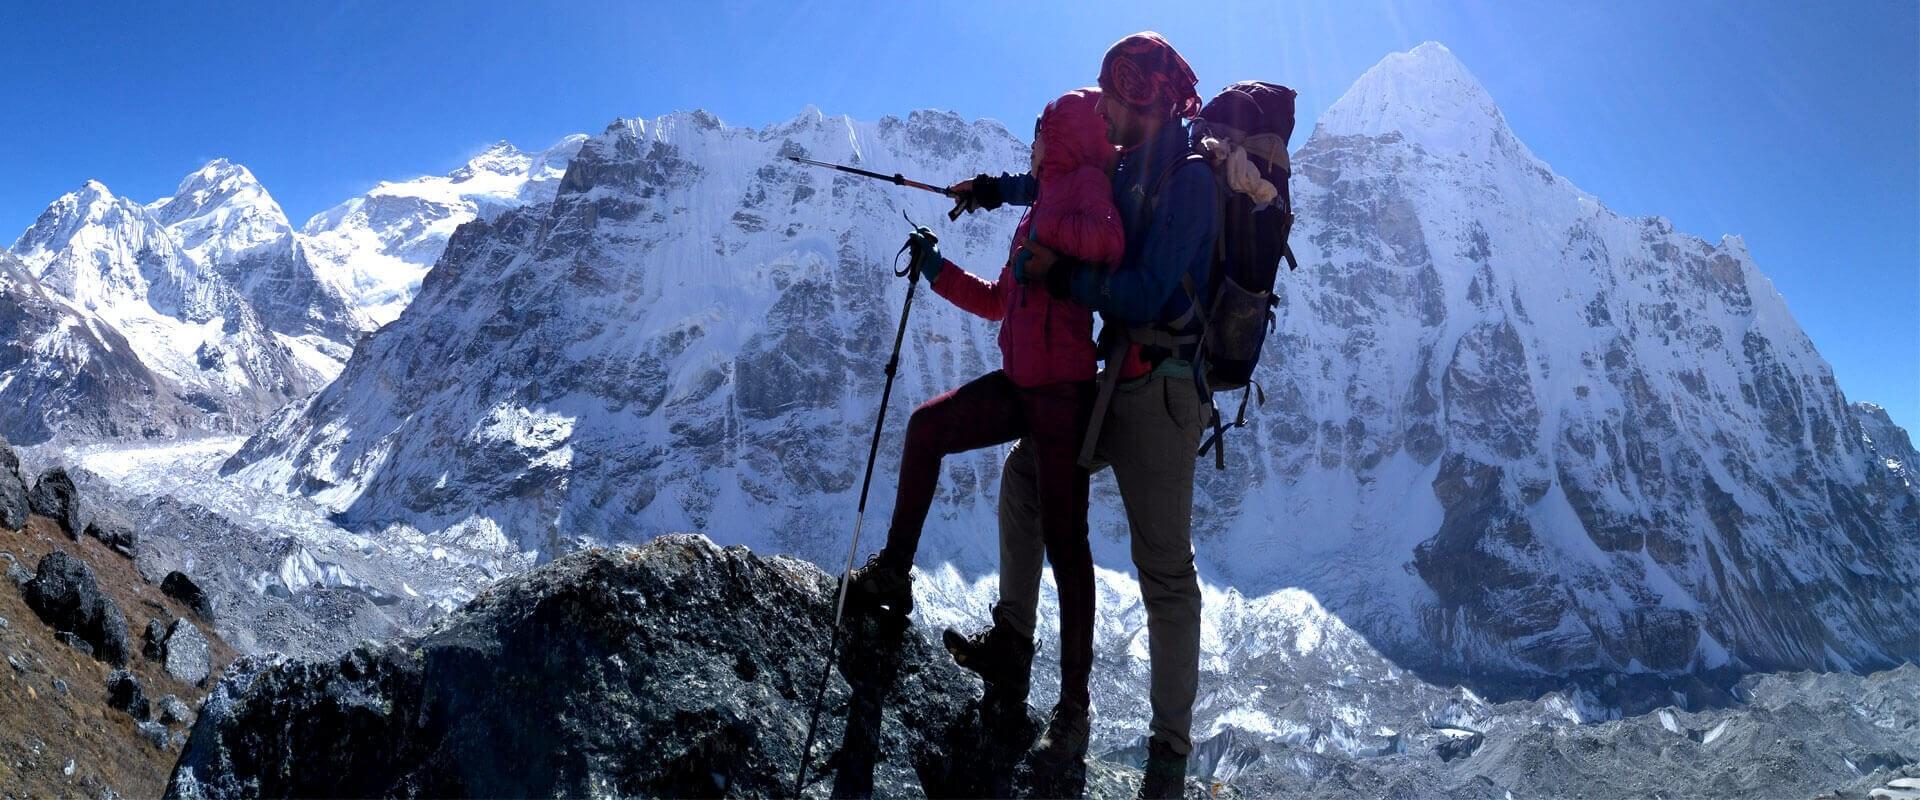 Short Kanchenjunga Circuit Trek - 16 Days